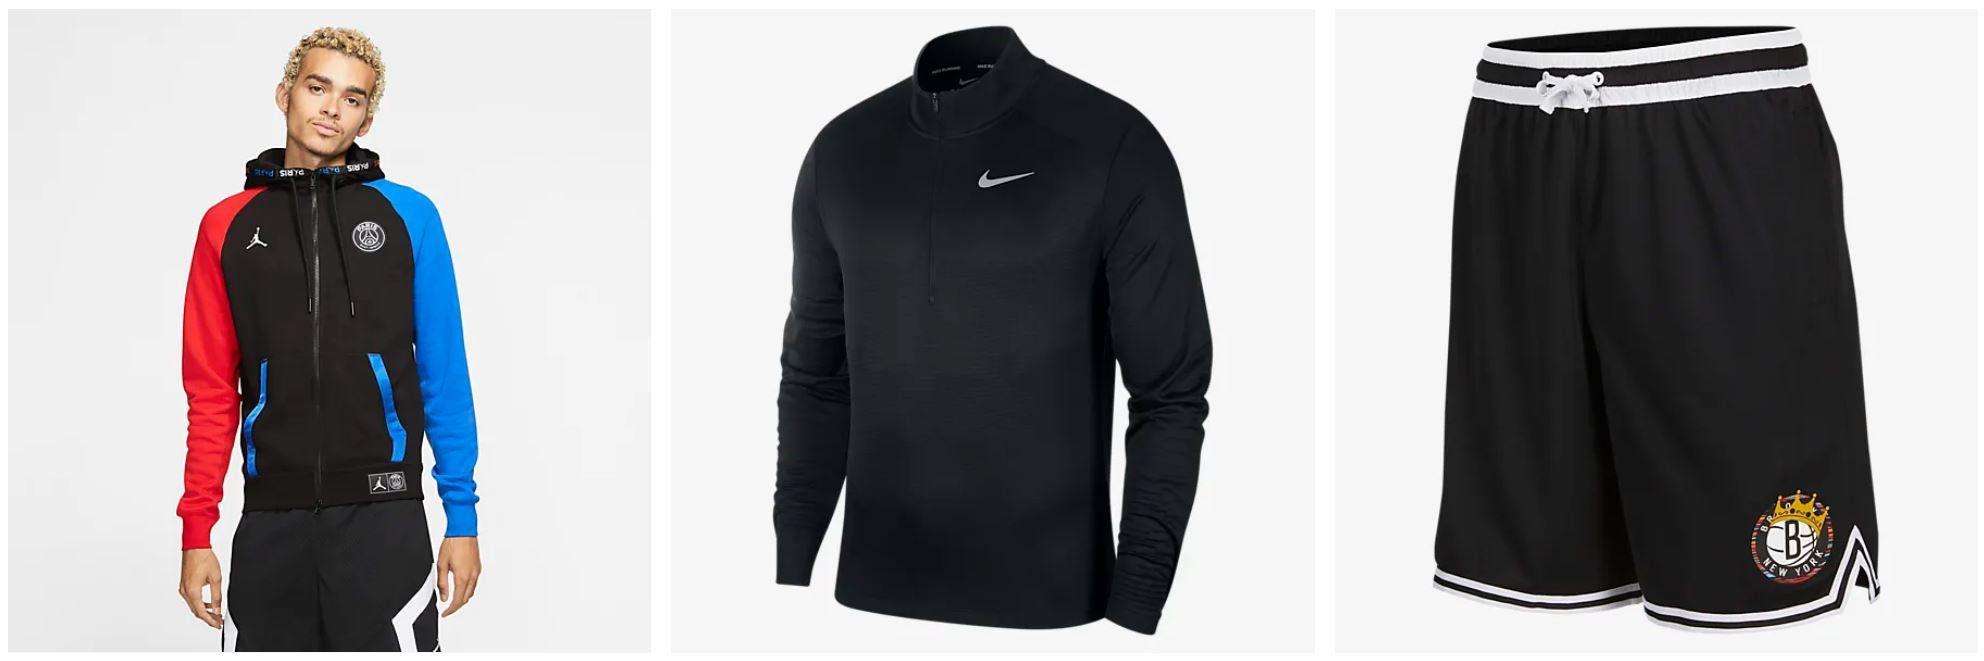 Hot! Nike Spring Aktion mit 25% extra Rabatt auf reguläre Ware + keine VSK ab 50€